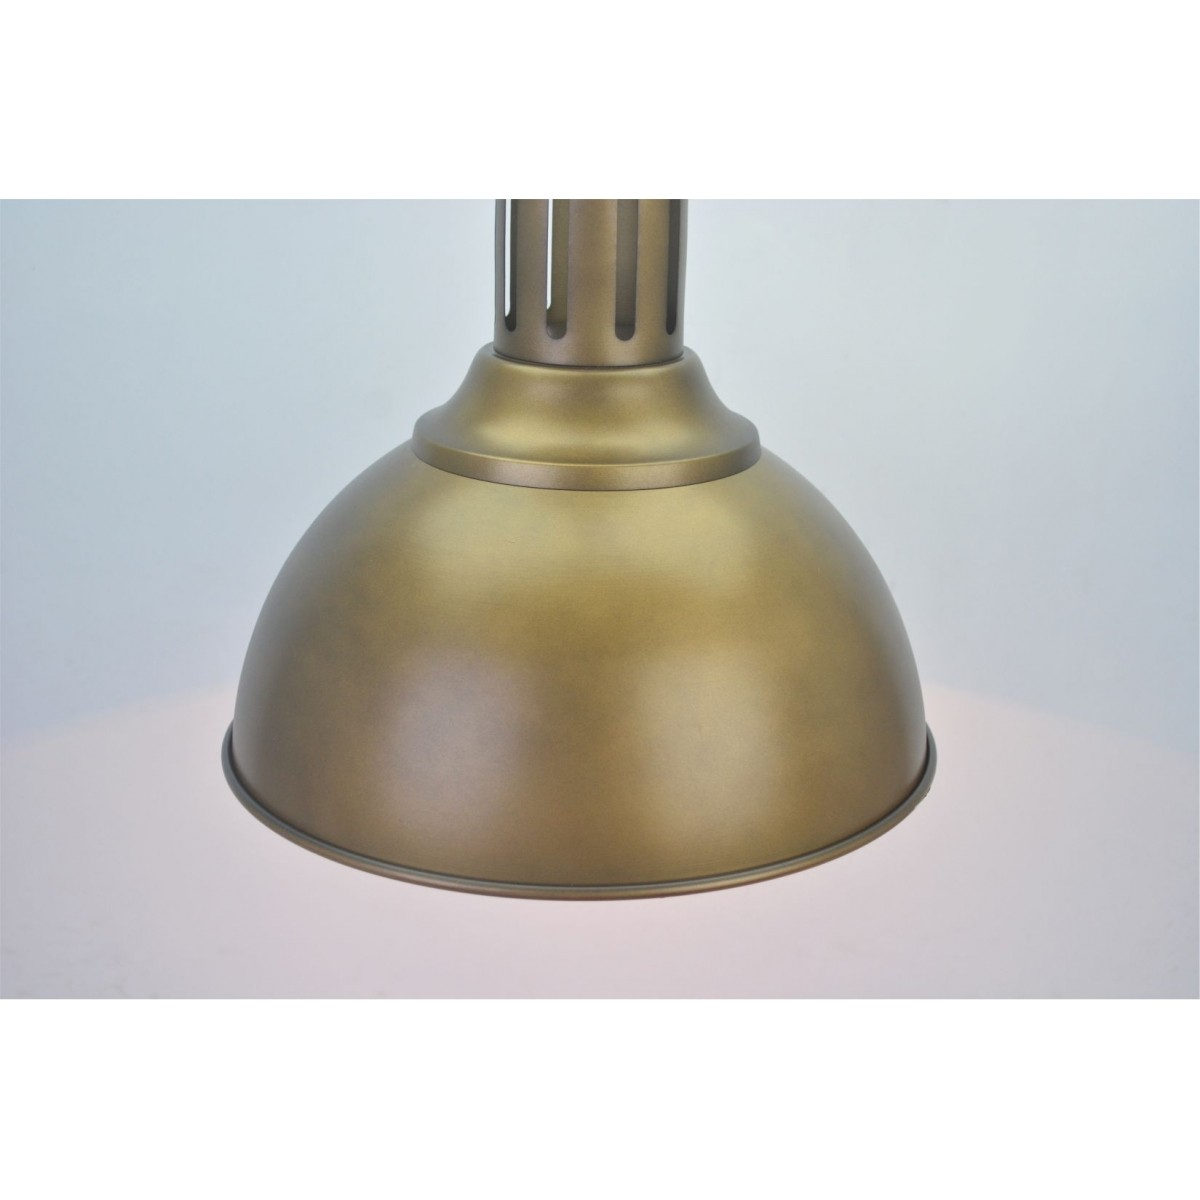 Lustre Pendente Retro Industrial VIII Metal Dourado Pelegrin PEL-050